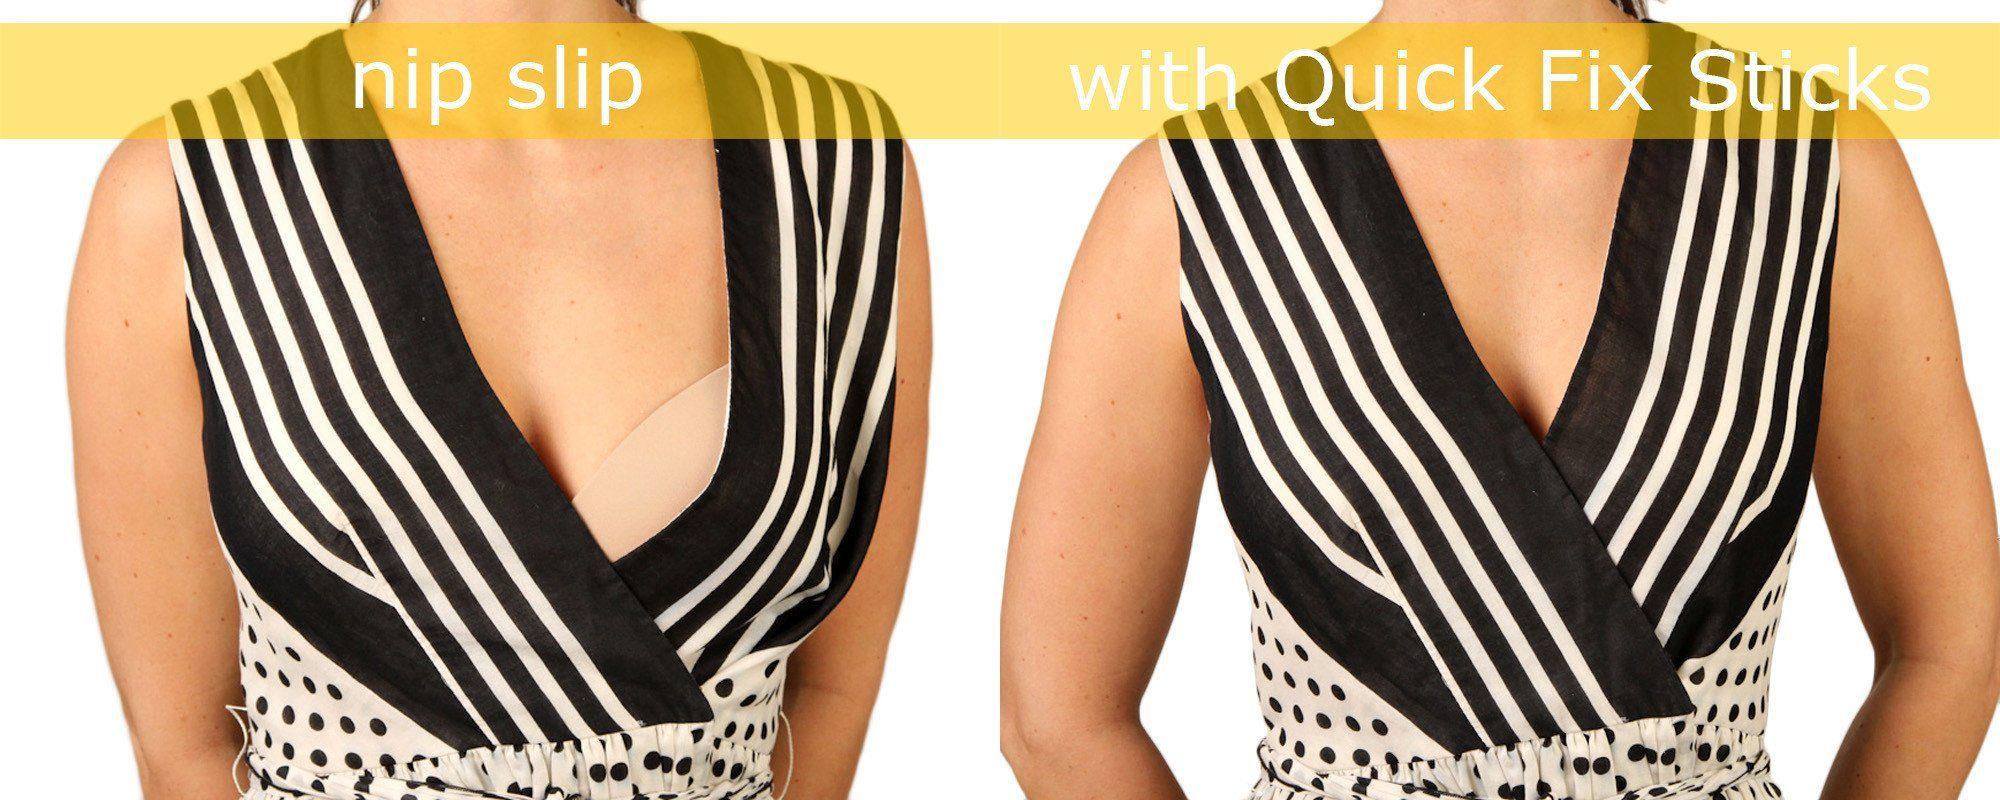 Quick Fix Sticks adhesive fashion tape \u0026 double stick body